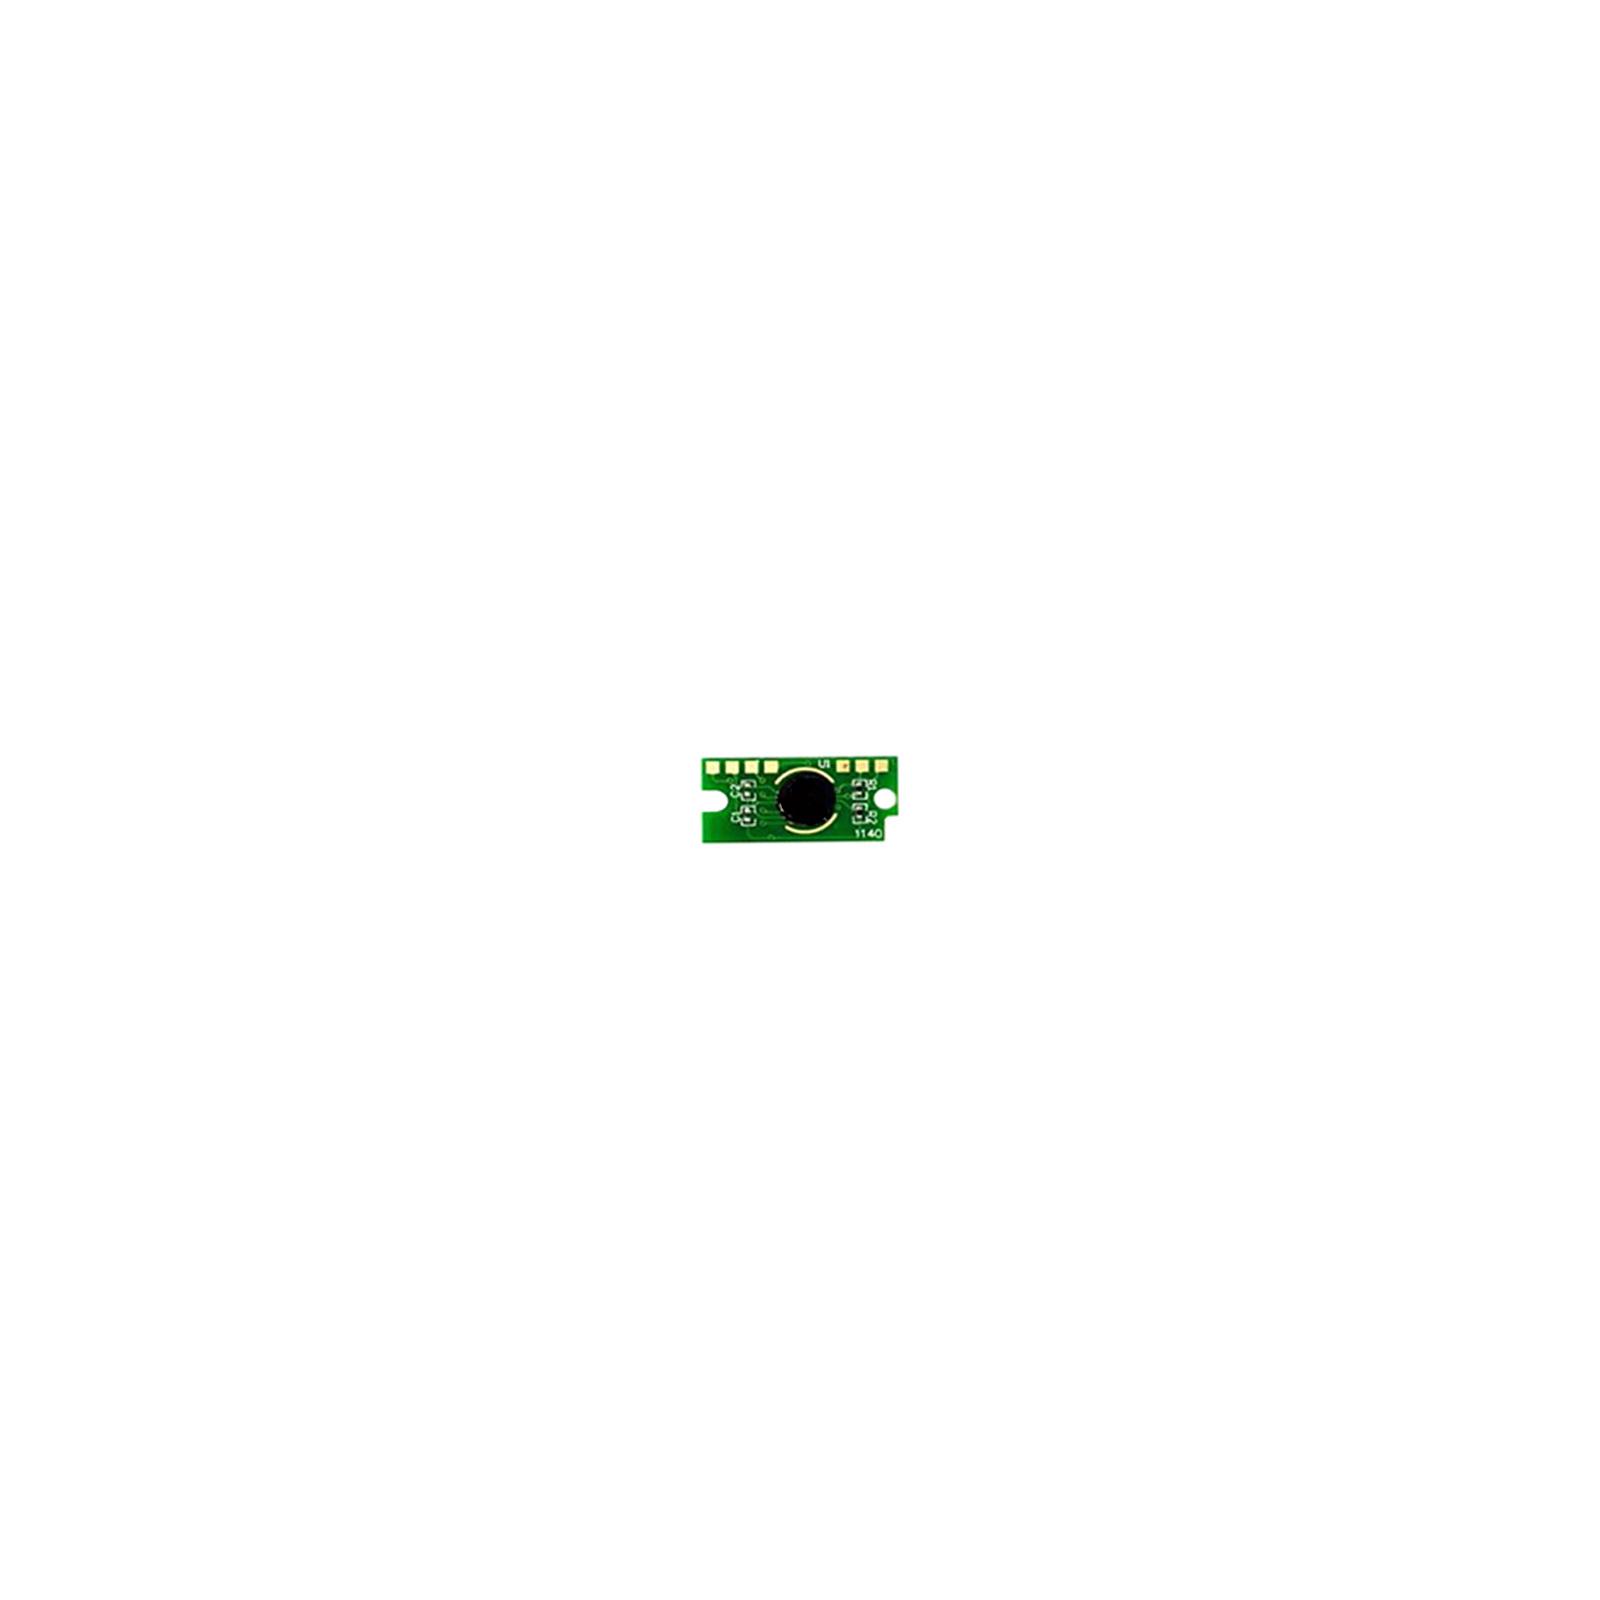 Чип для картриджа Xerox Phaser 6020 (106R02760) 1k cyan Static Control (X6020CP-CLA)